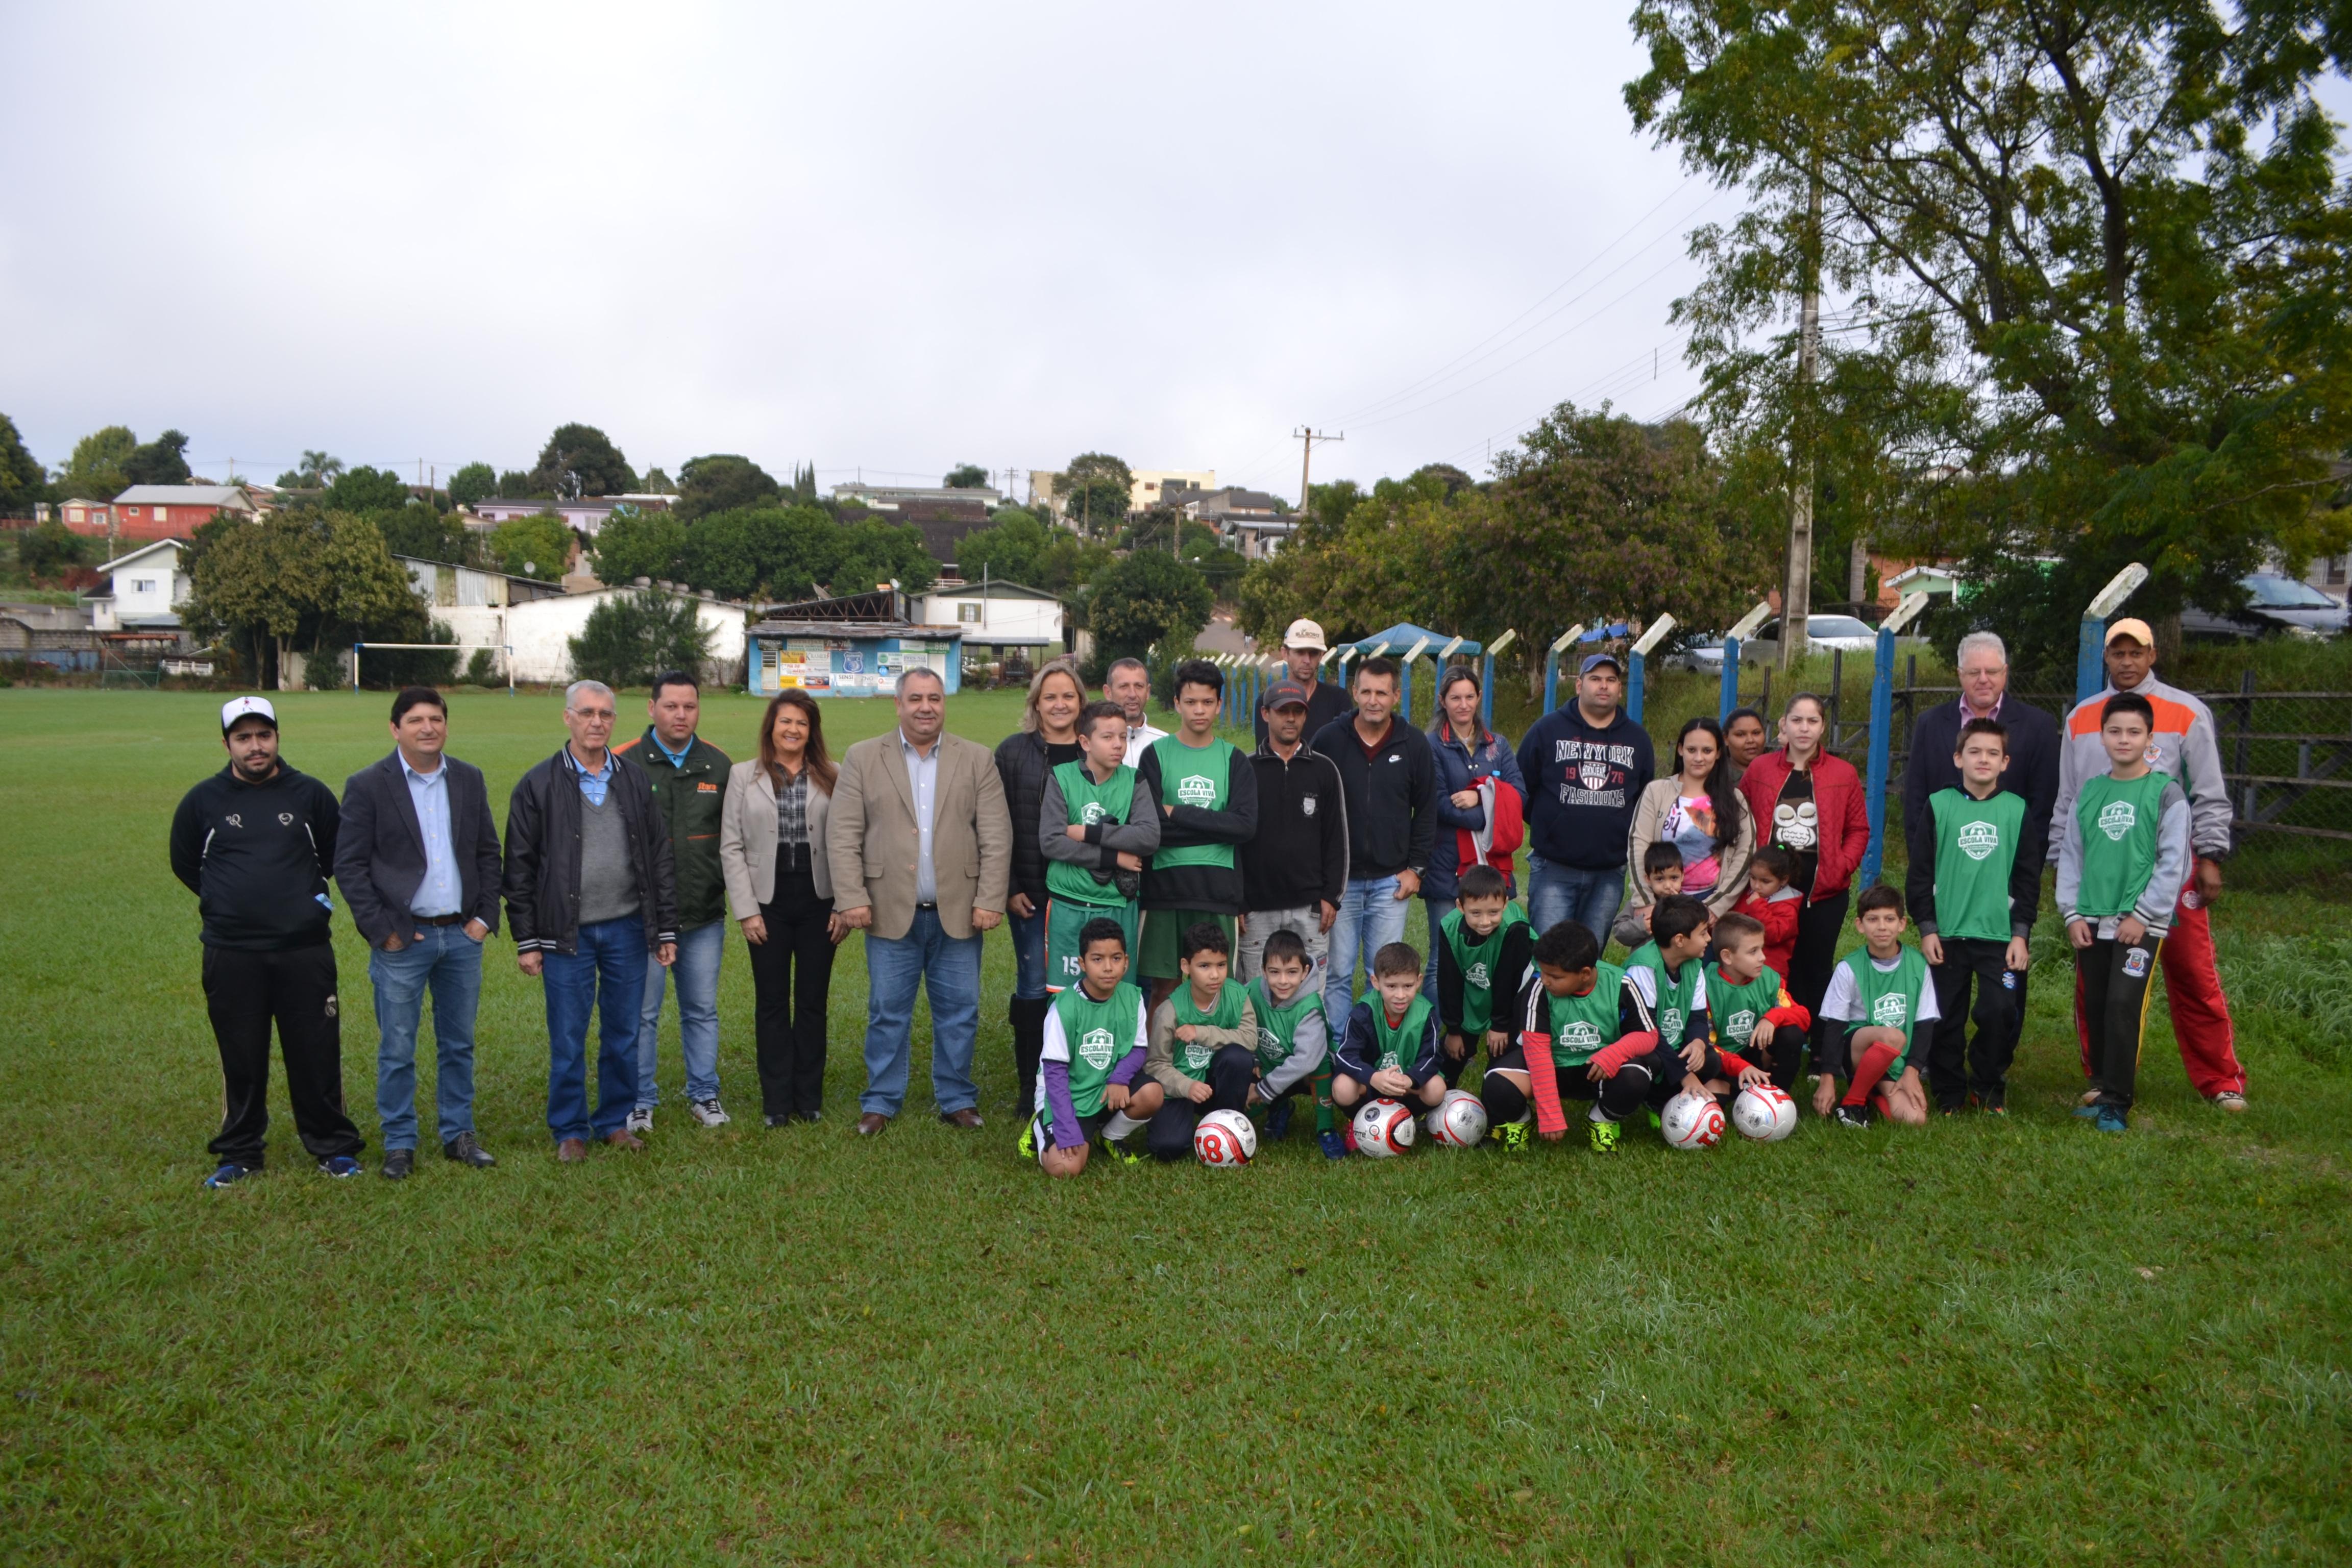 Inicia projeto municipal de futebol Escola Viva